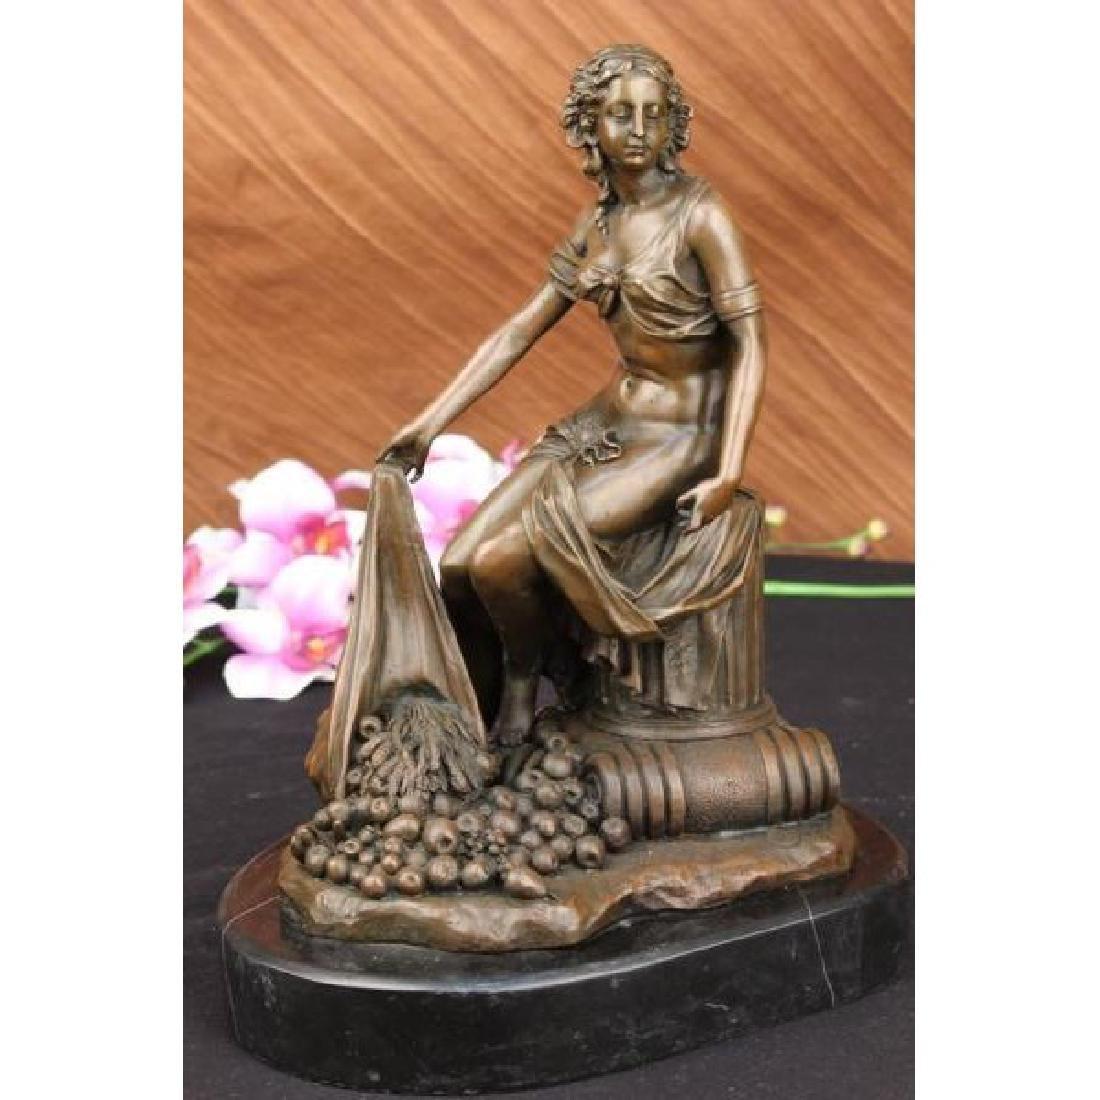 Vintage bronze statue ancient Roman-Greek mythology